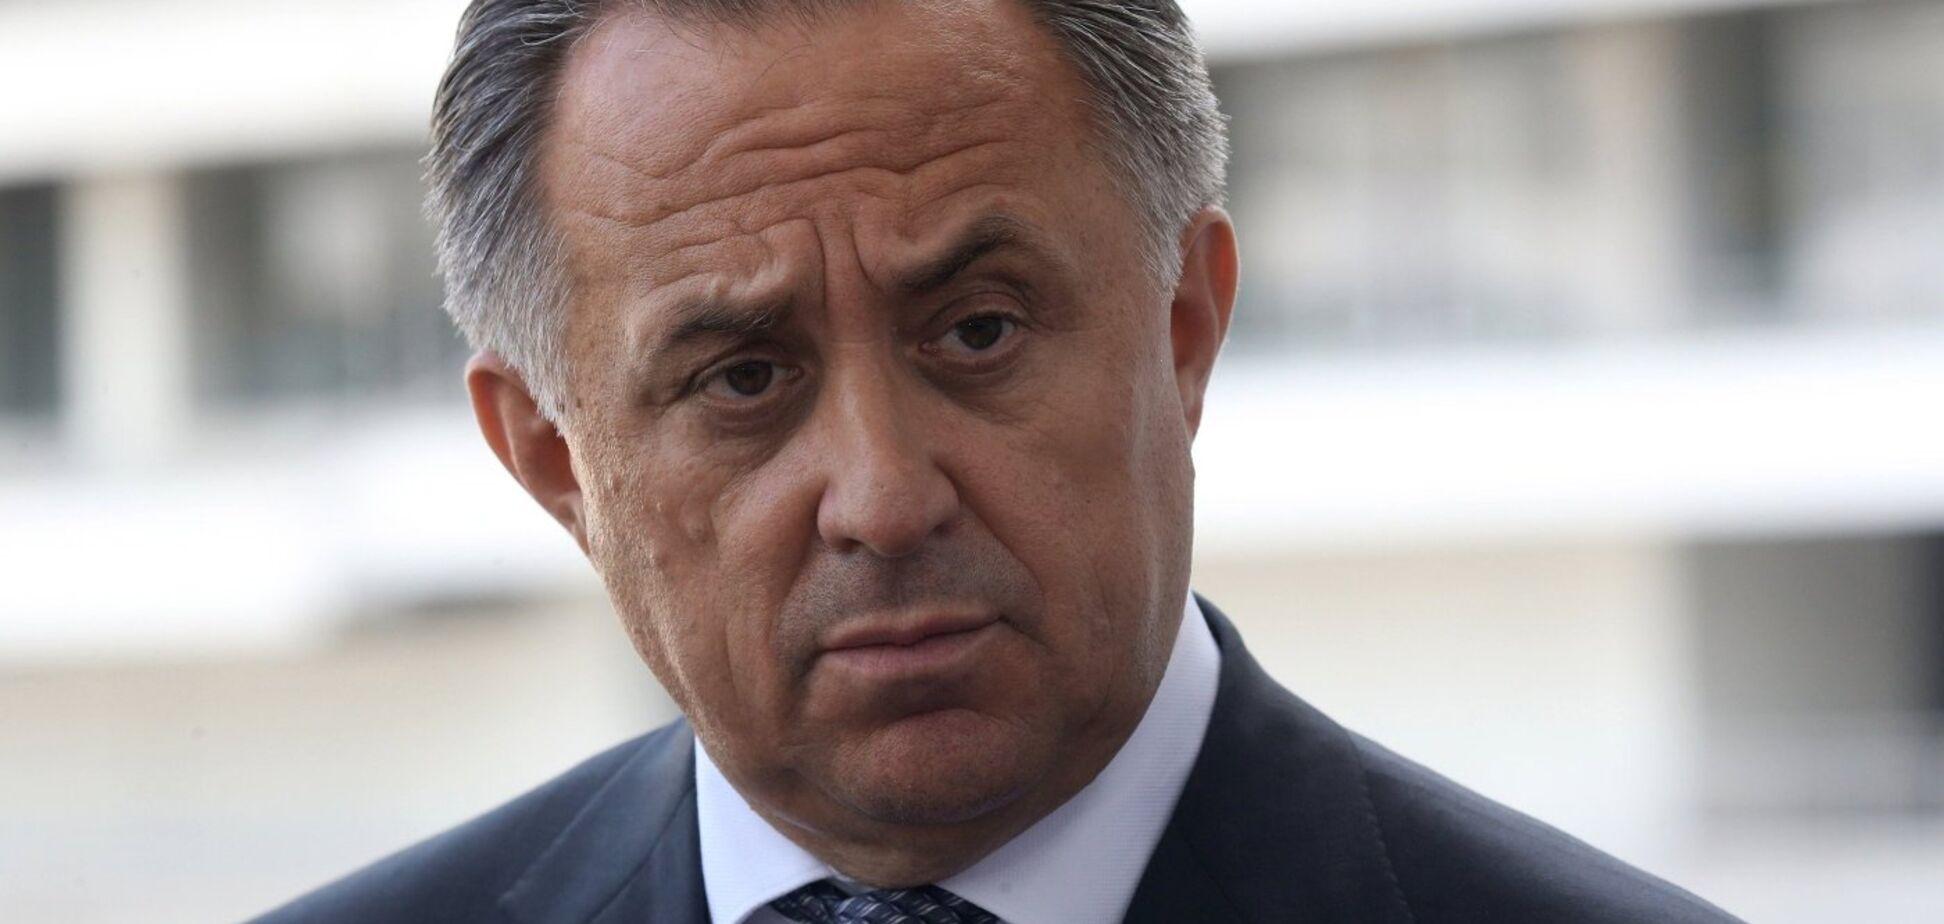 'Ноу криминалити?' ФИФА 'прокинула' в России друга Путина